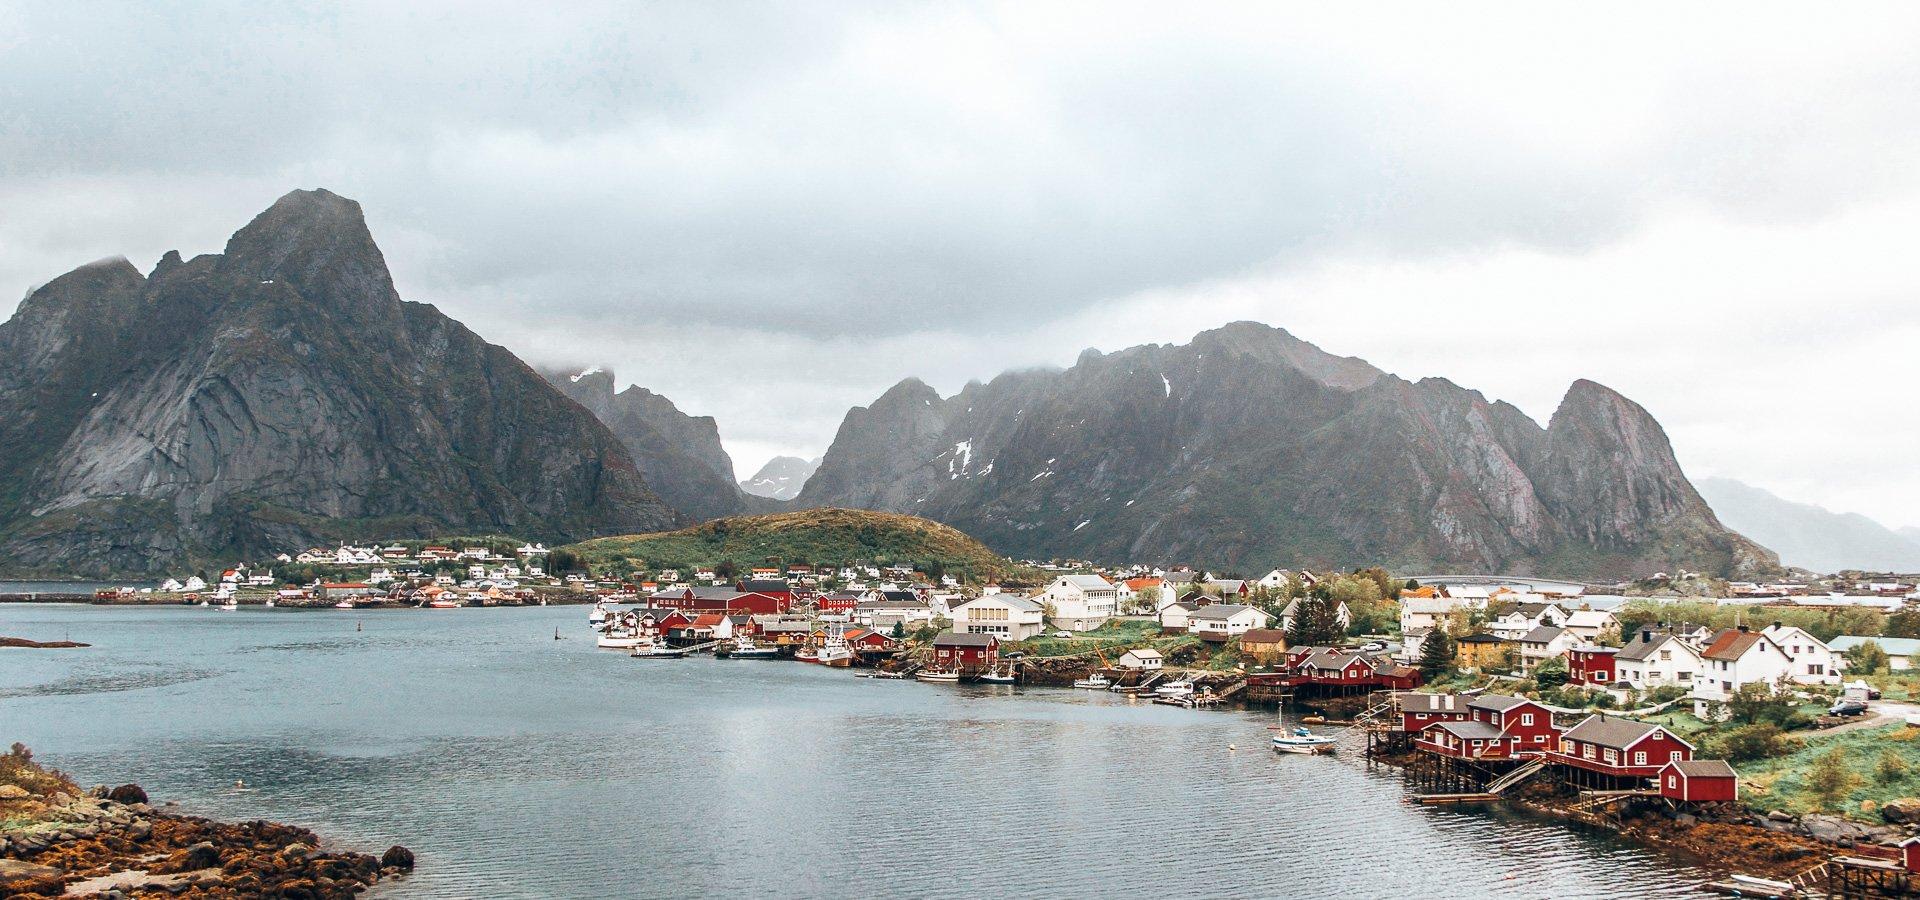 20 Amazing Photos of Norway That Will Leave You Breathless | lofoten island trolltunga photography 16